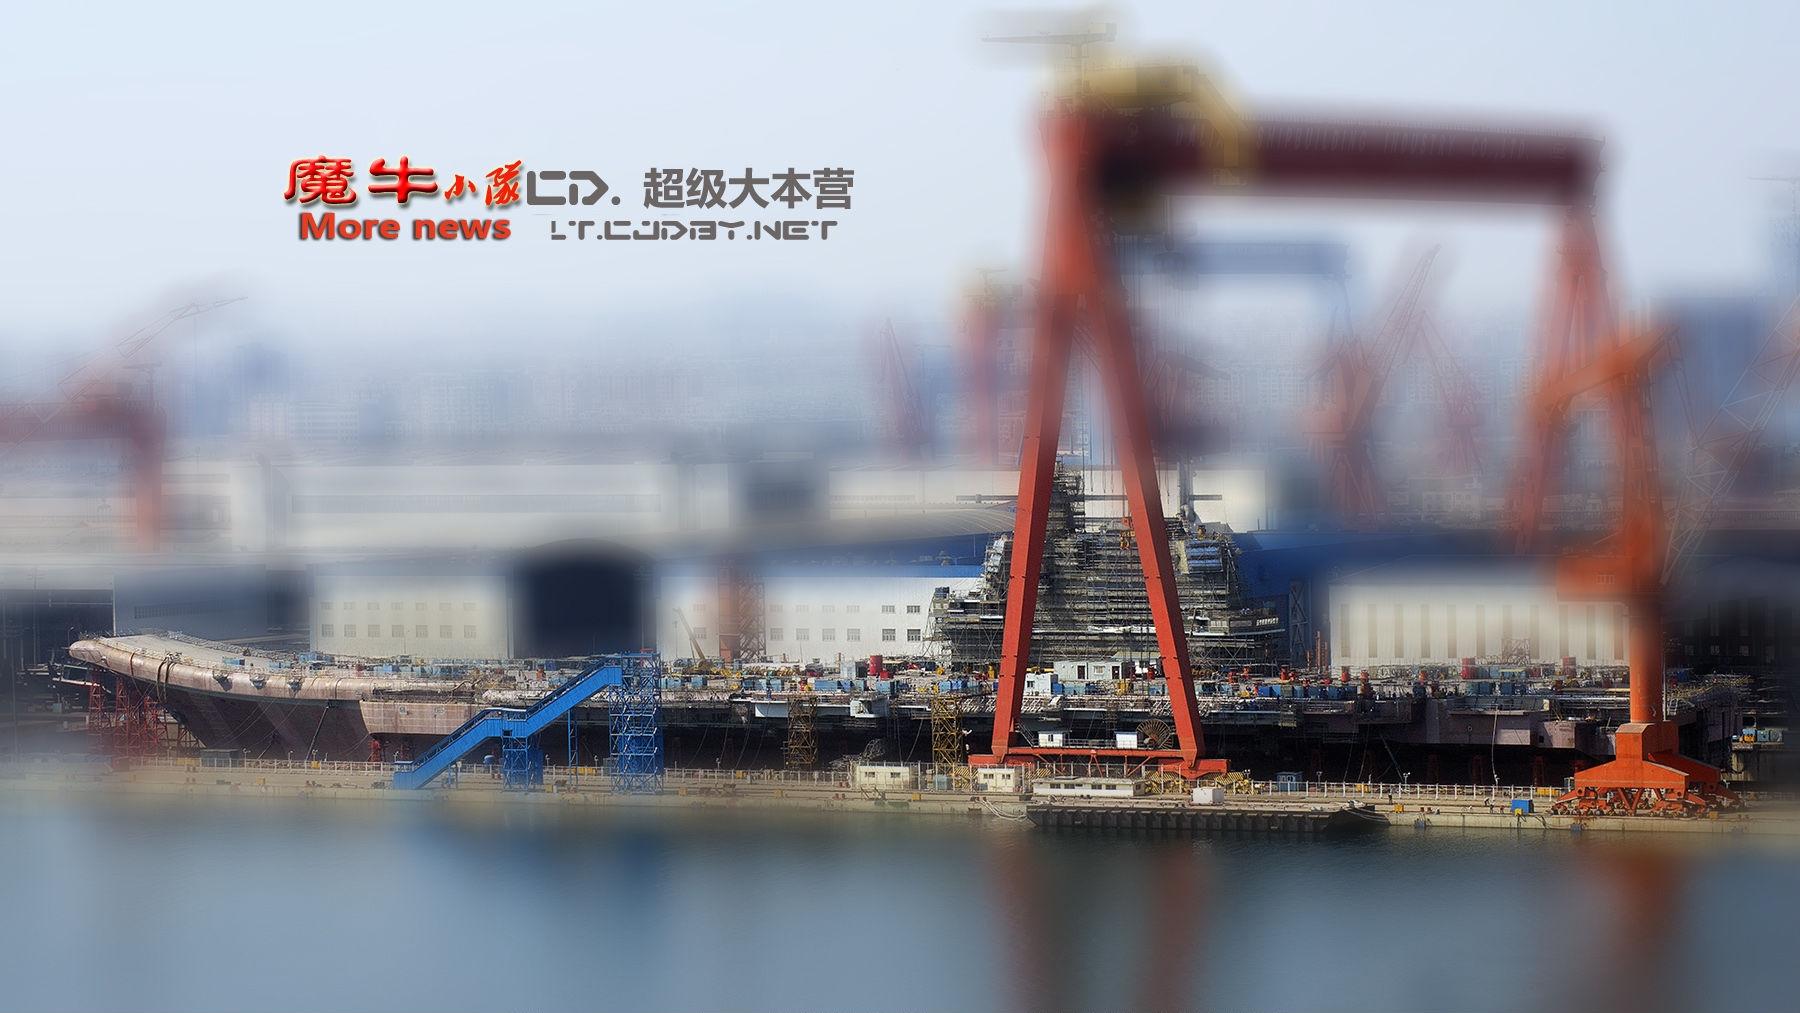 porte-avions chinois